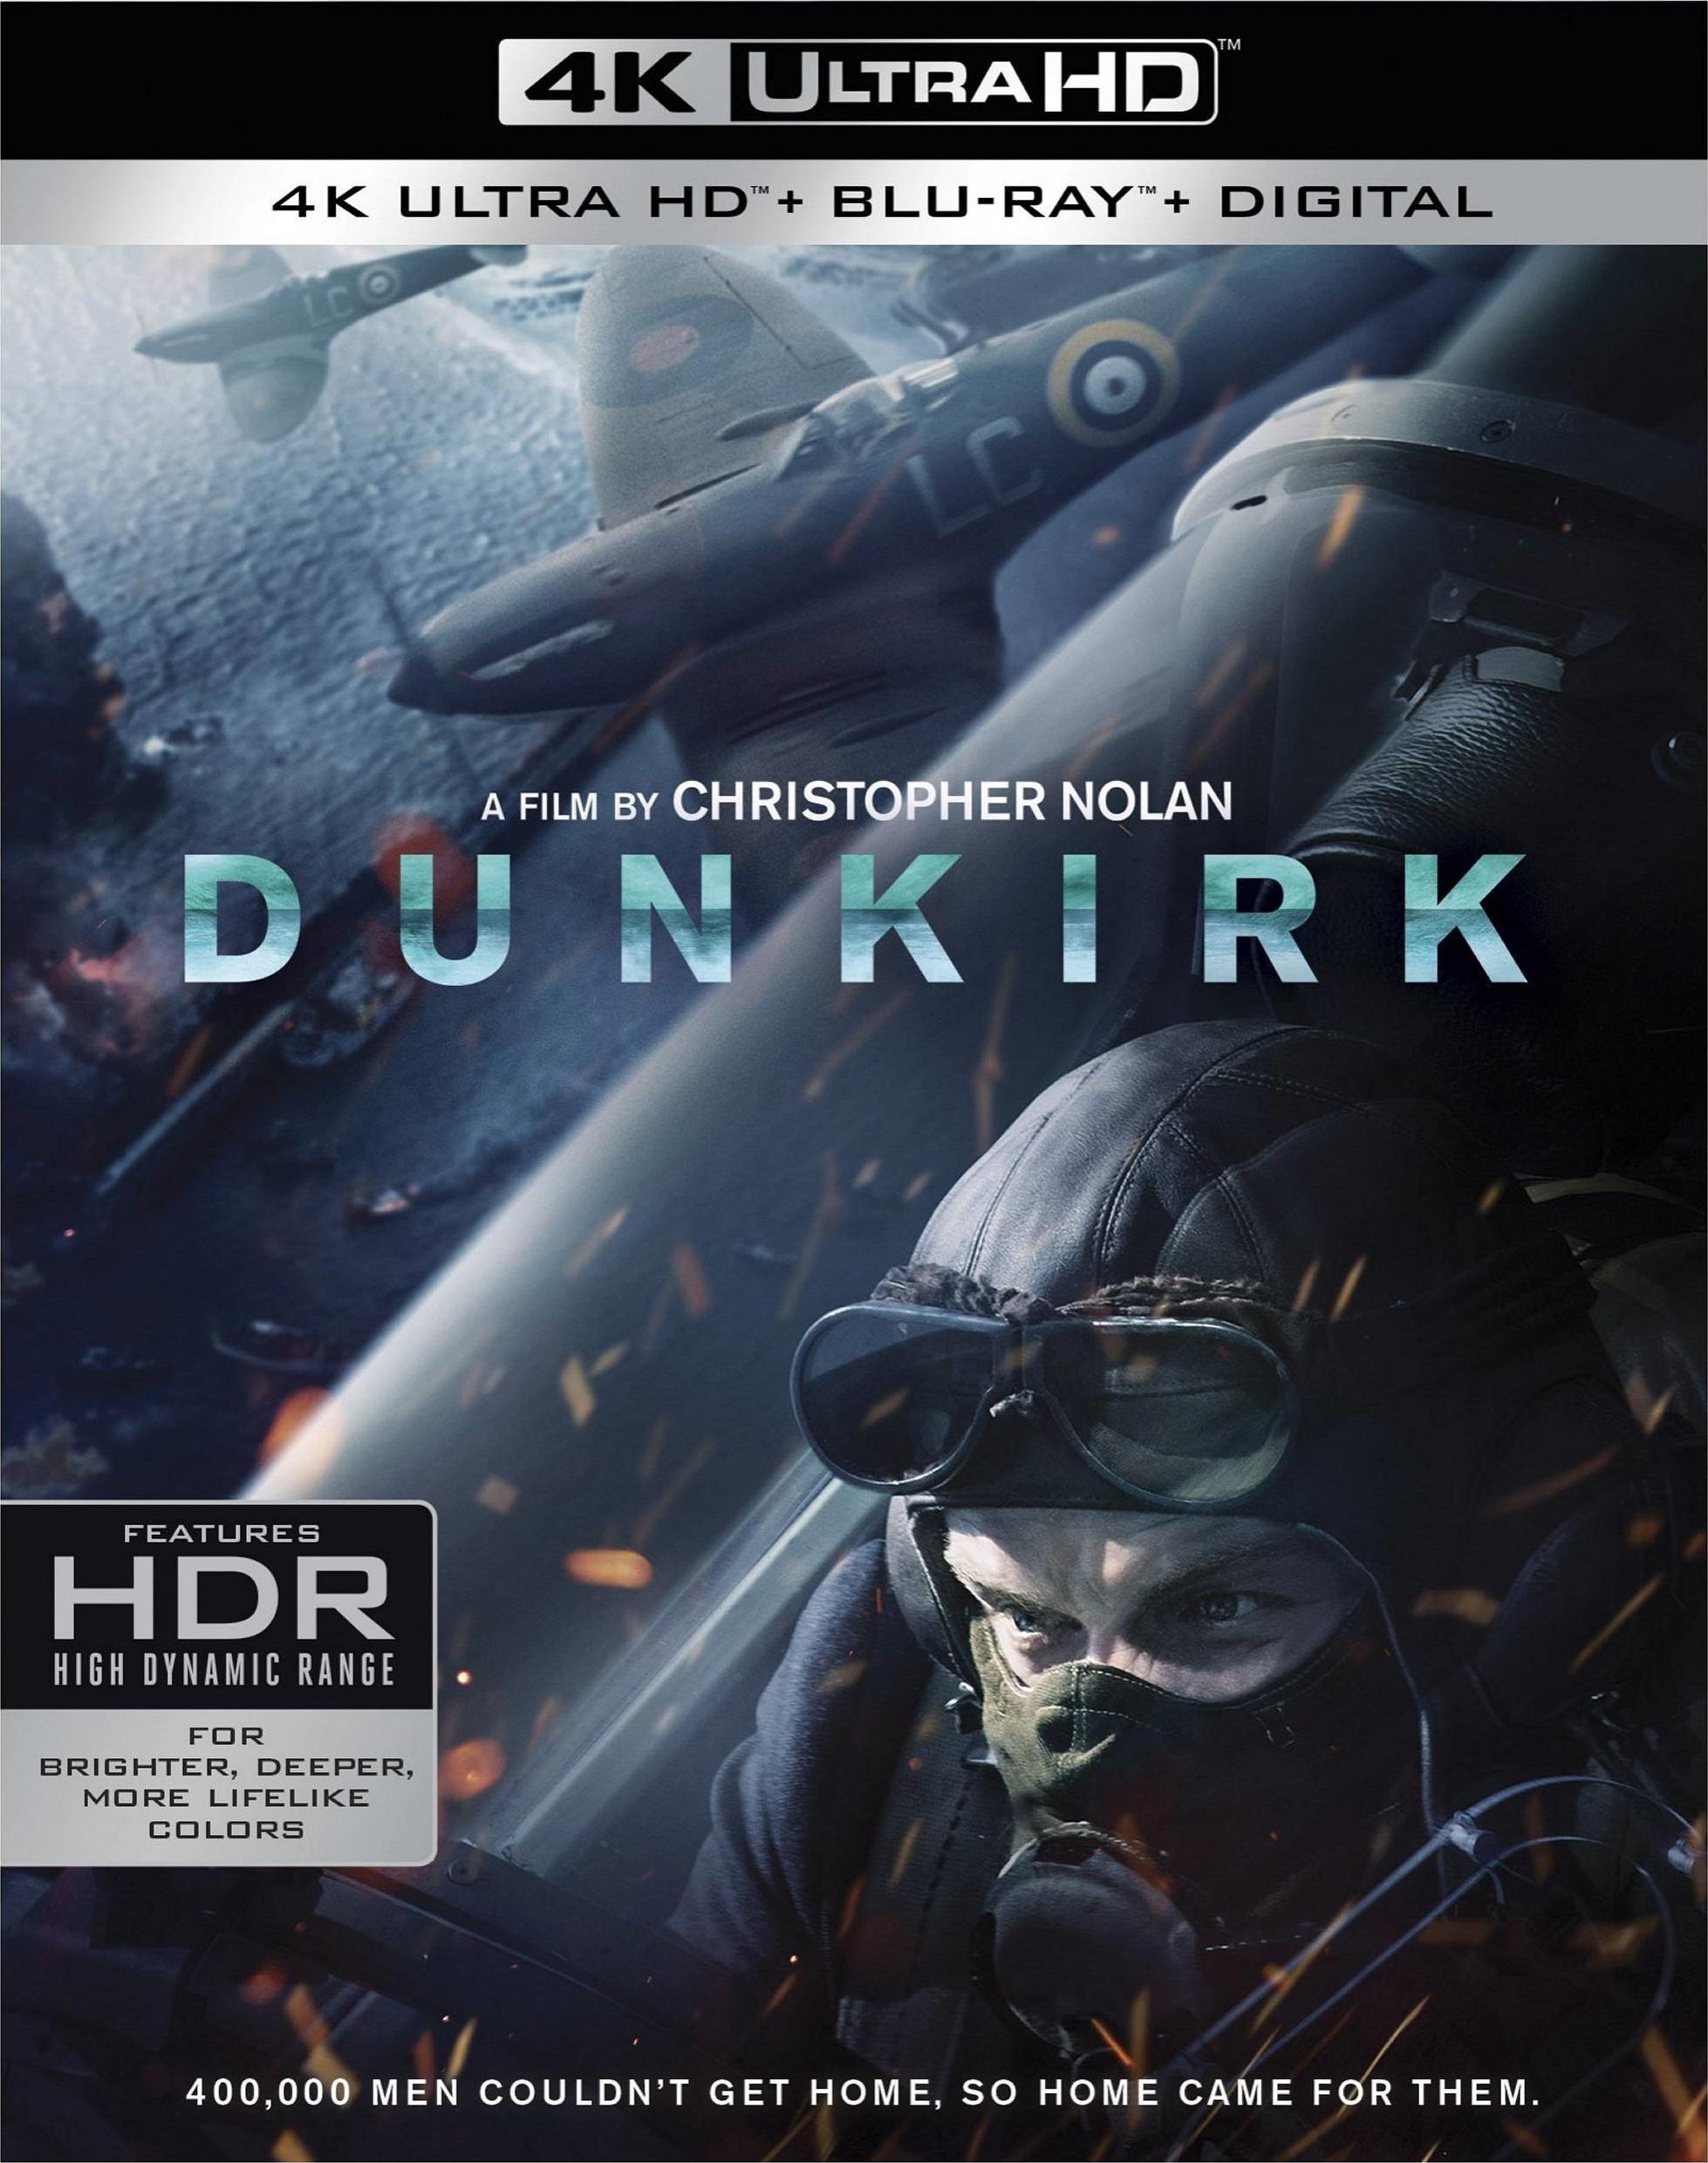 Dunkirk 4K (2017) UHD Ultra HD Blu-ray